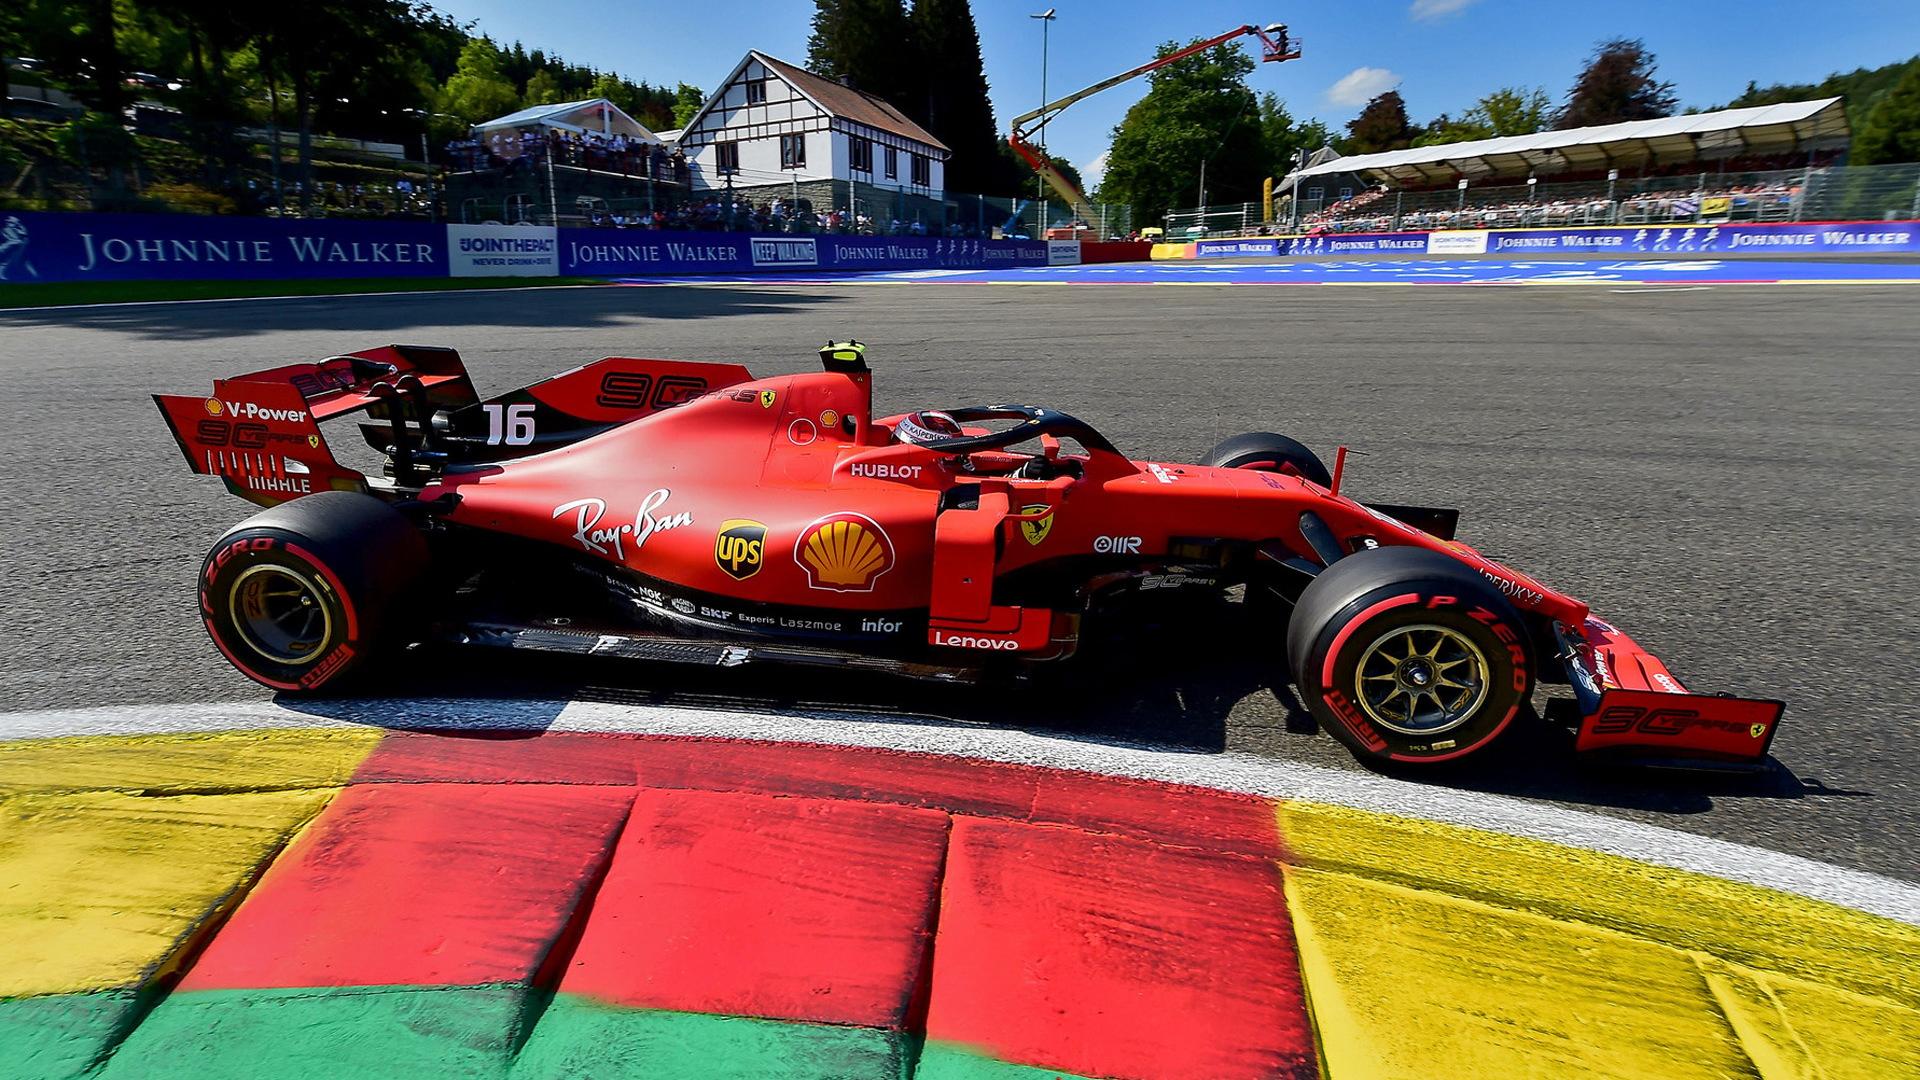 Ferrari's Charles Leclerc at the 2019 Formula One Belgian Grand Prix